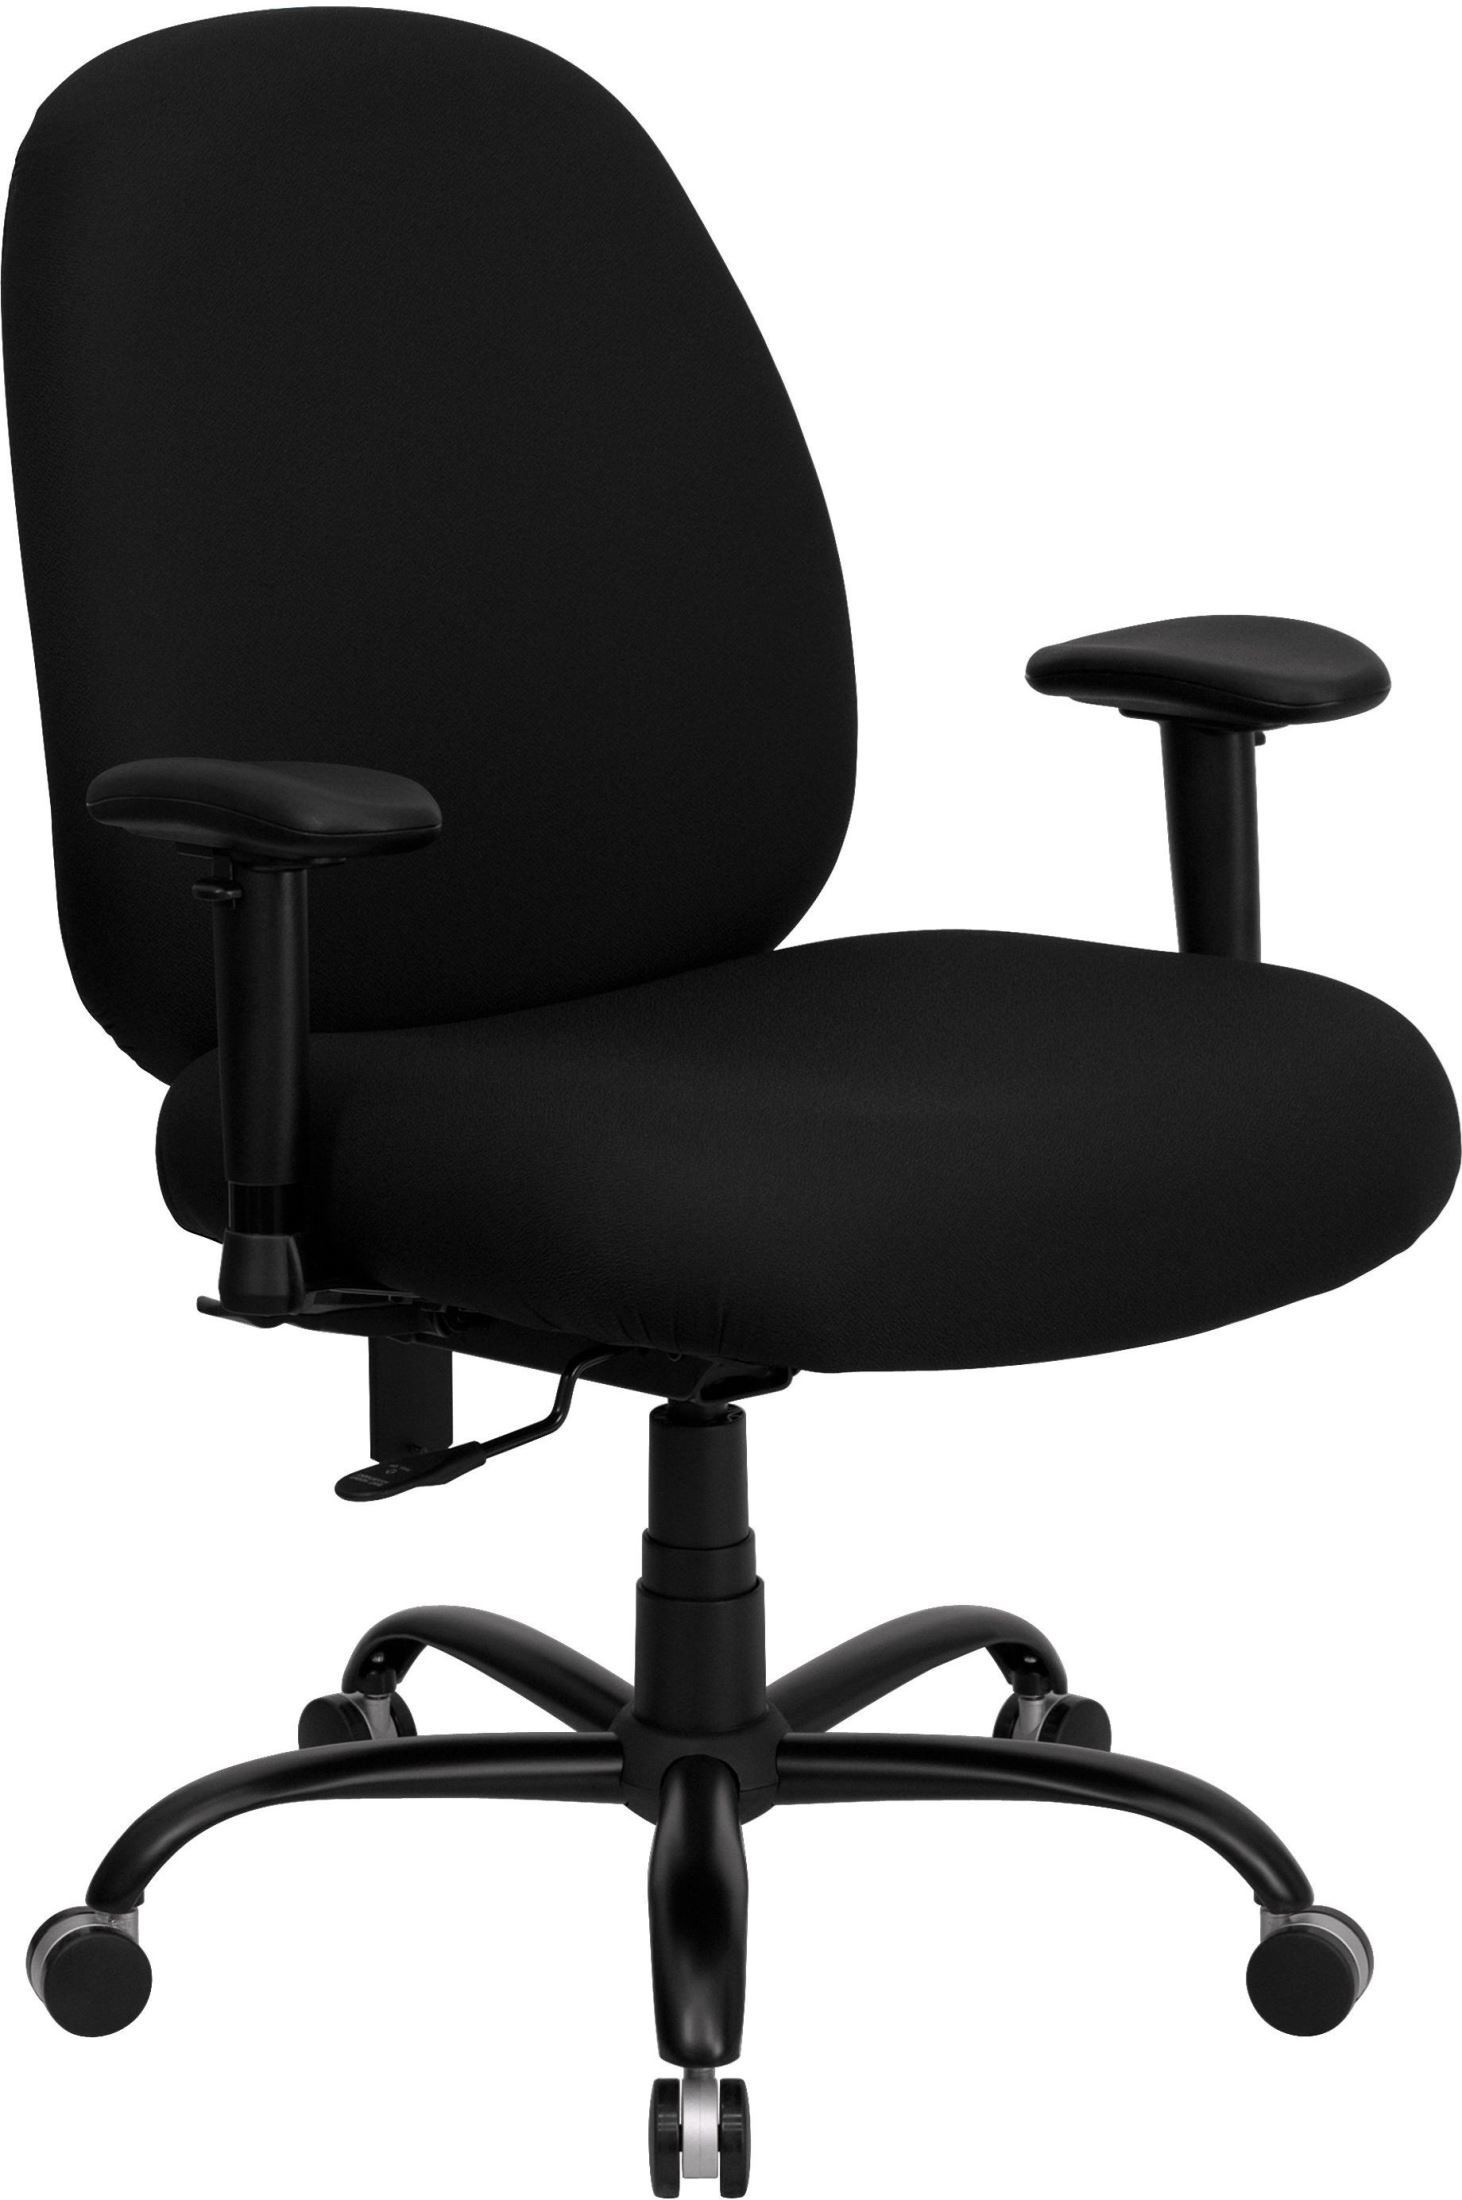 Hercules 500 Lb. Capacity Big And Tall Black Office Chair ...